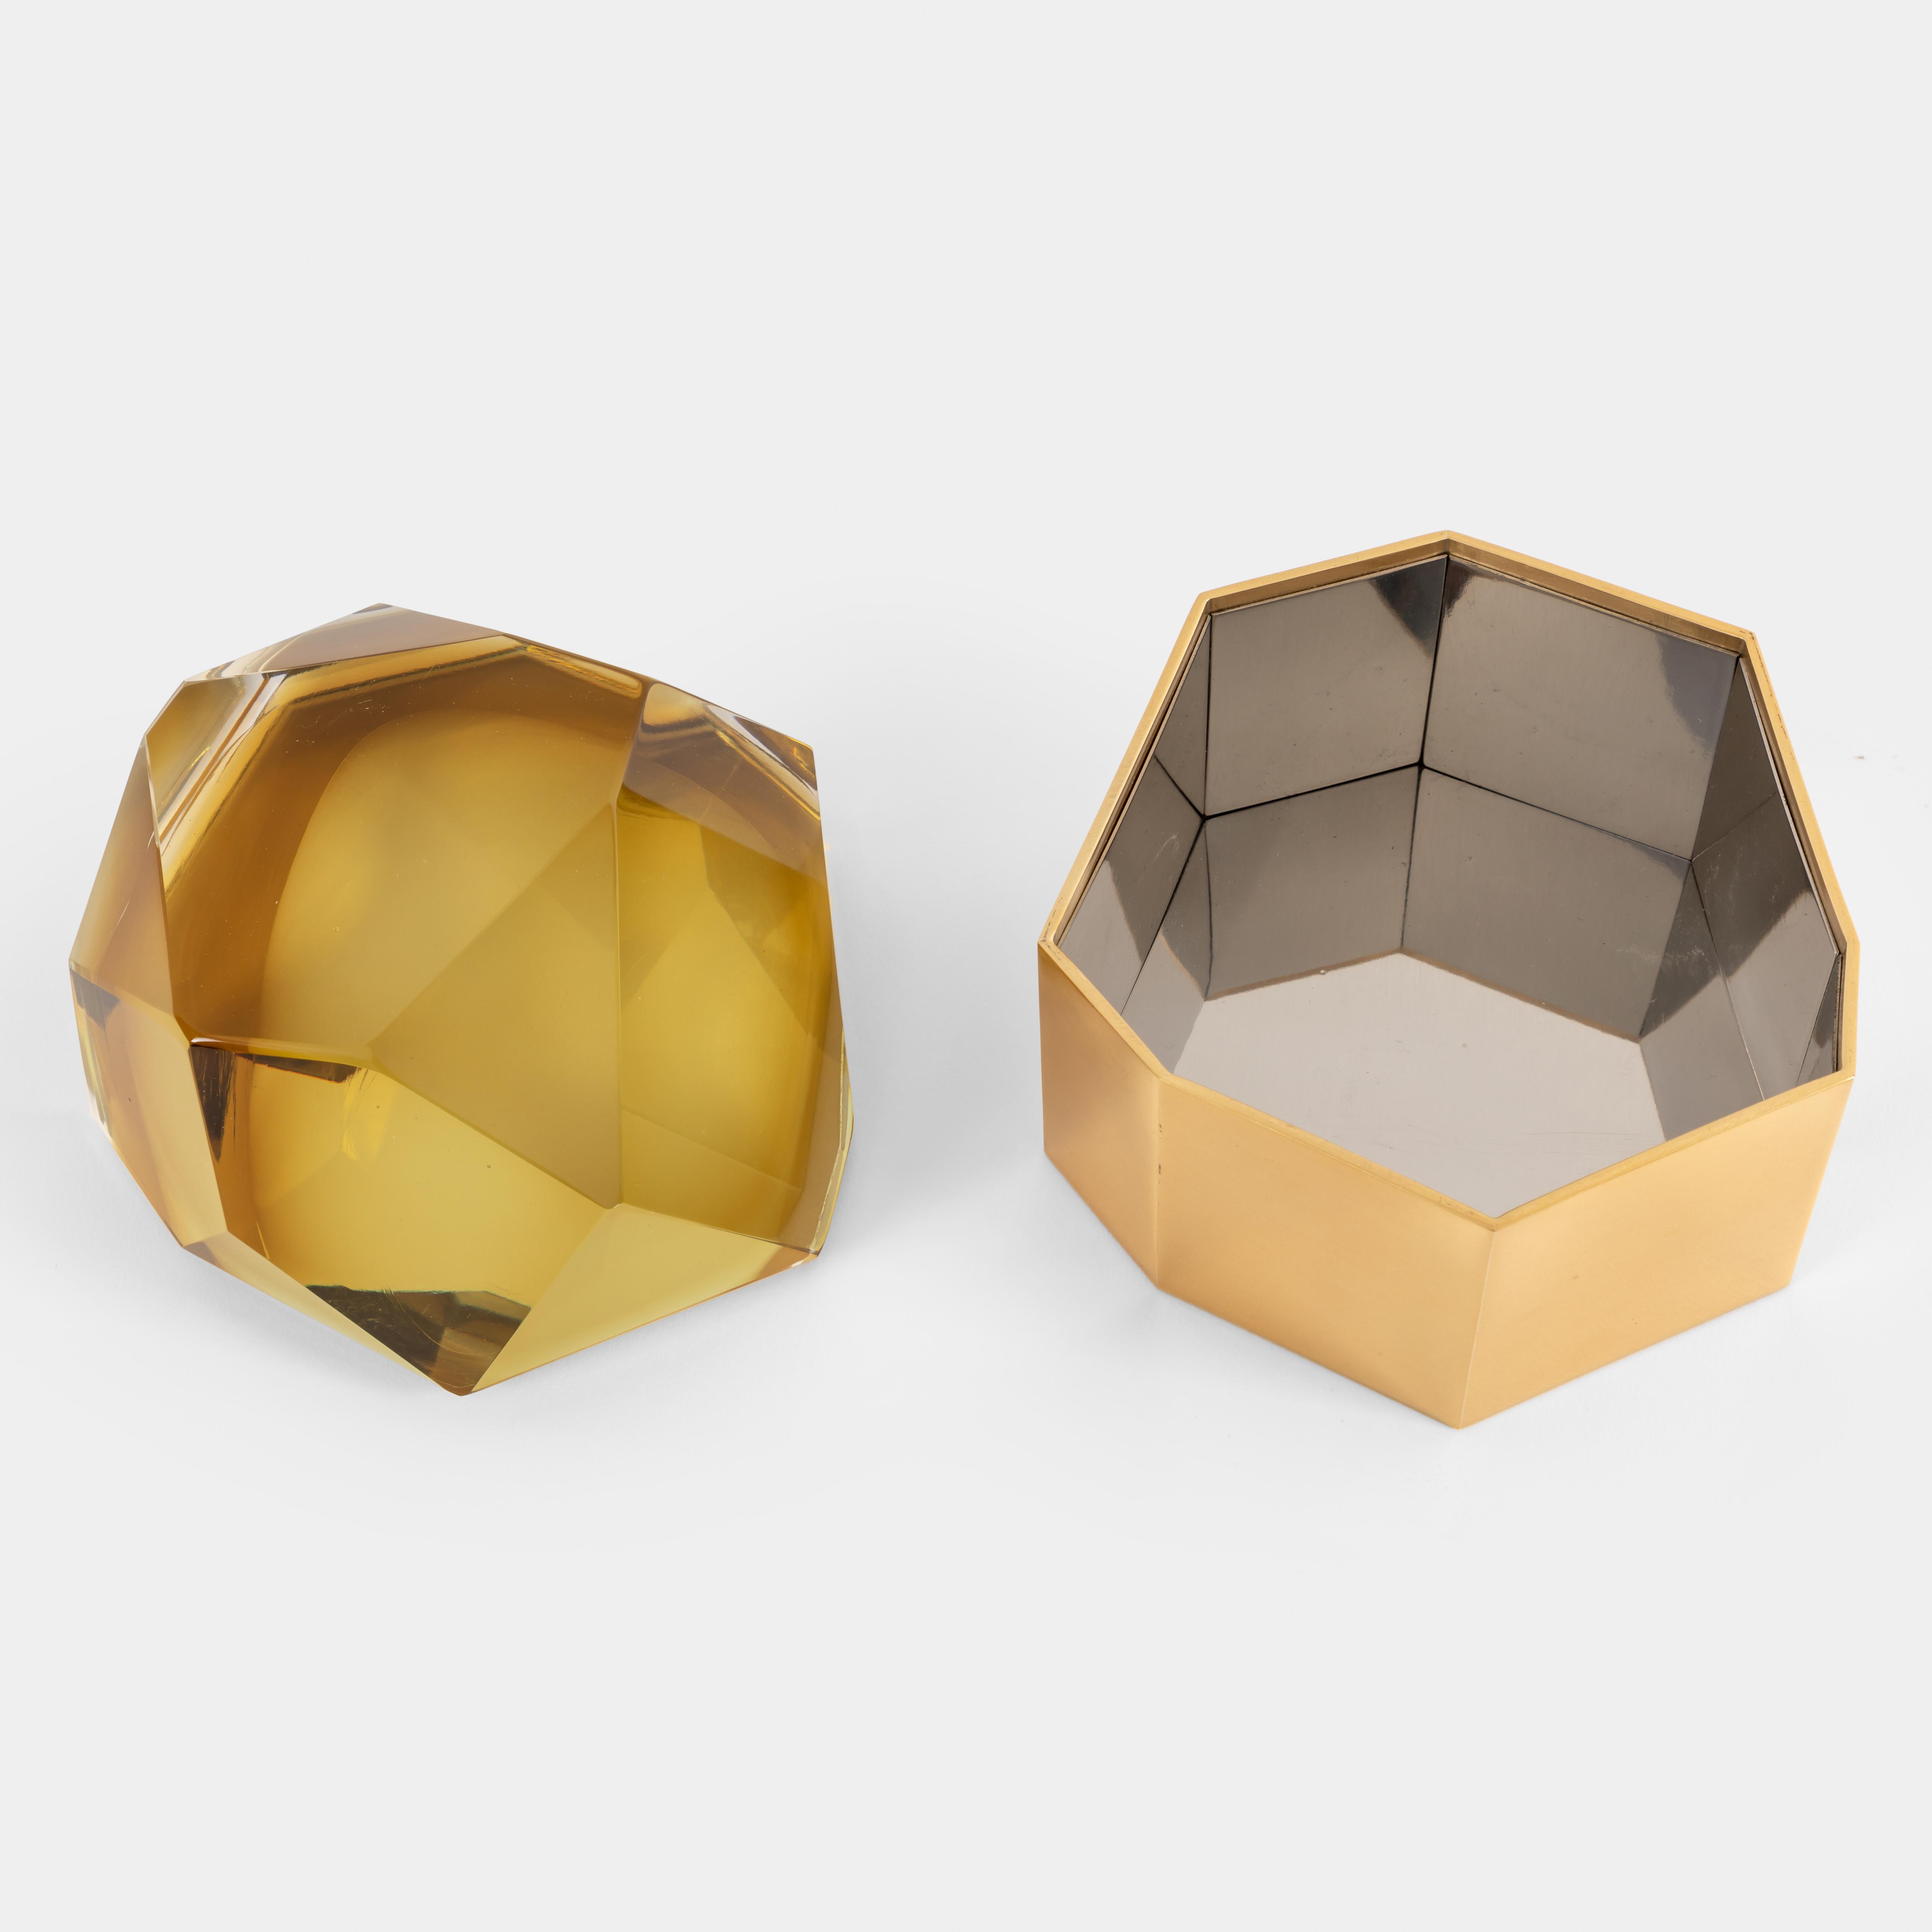 Amber 'Diamante Murano' Glass Box by Roberto Giulio Rida | soyun k.